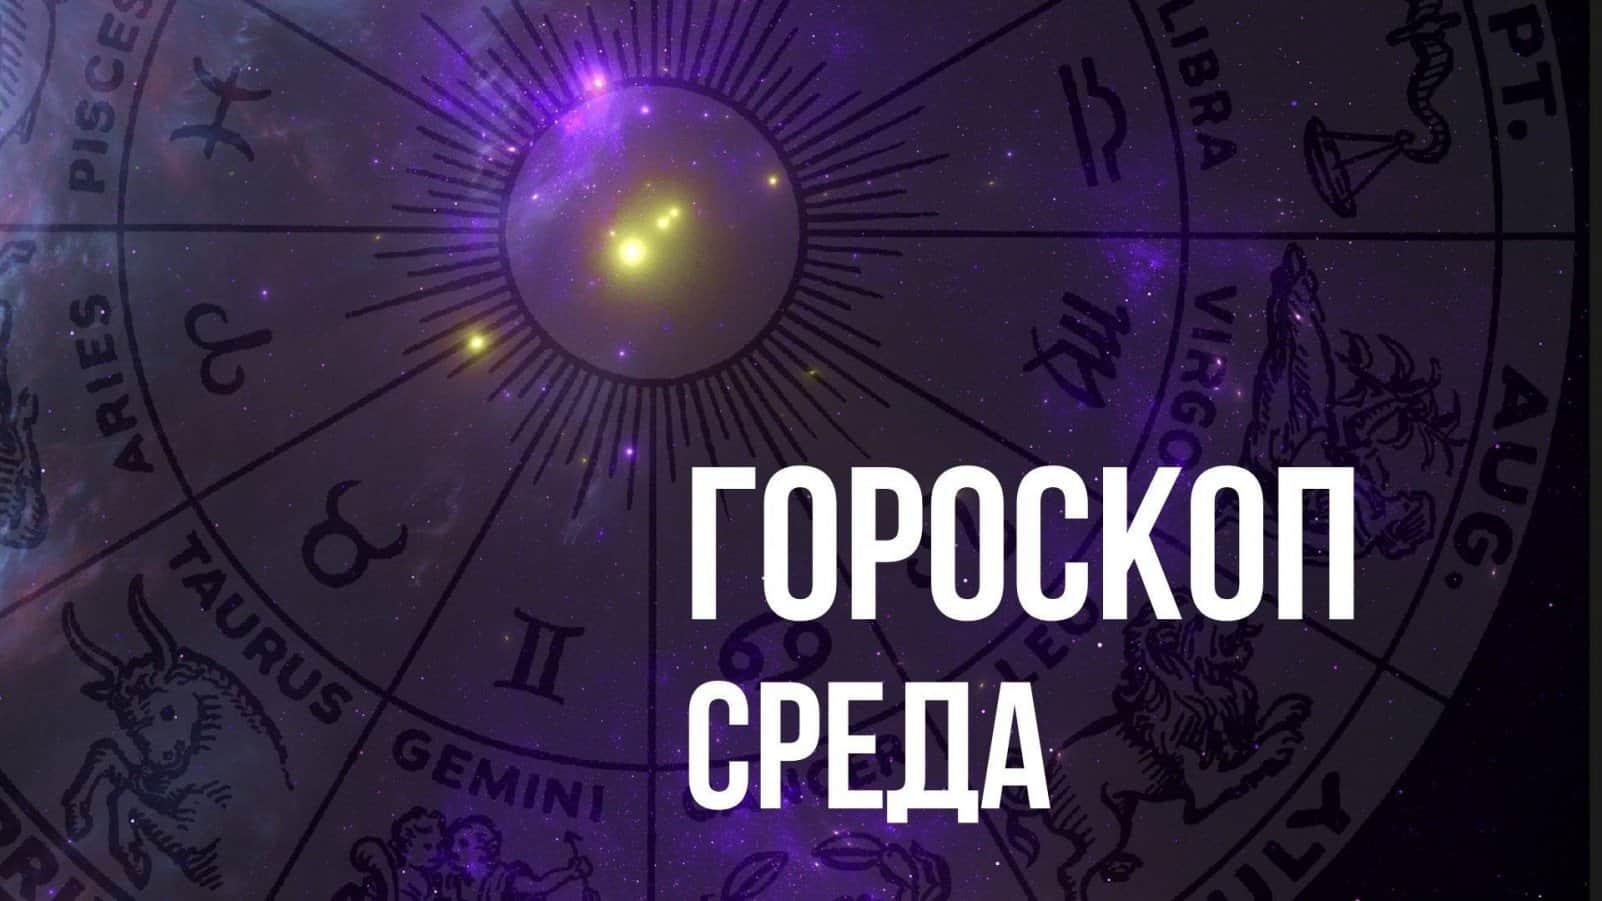 Гороскоп на среду 17 марта для каждого знака Зодиака